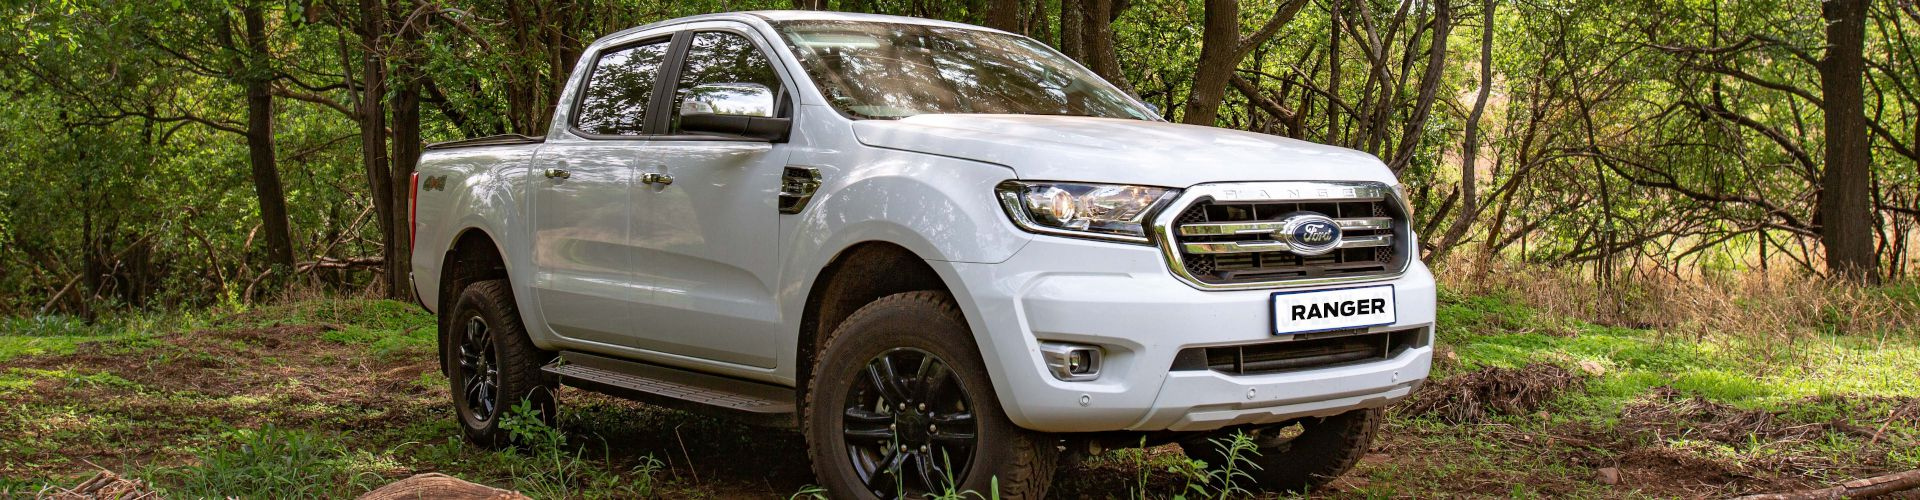 Ford Ranger XLT - Α. Λιάπης Αντιπροσωπεία